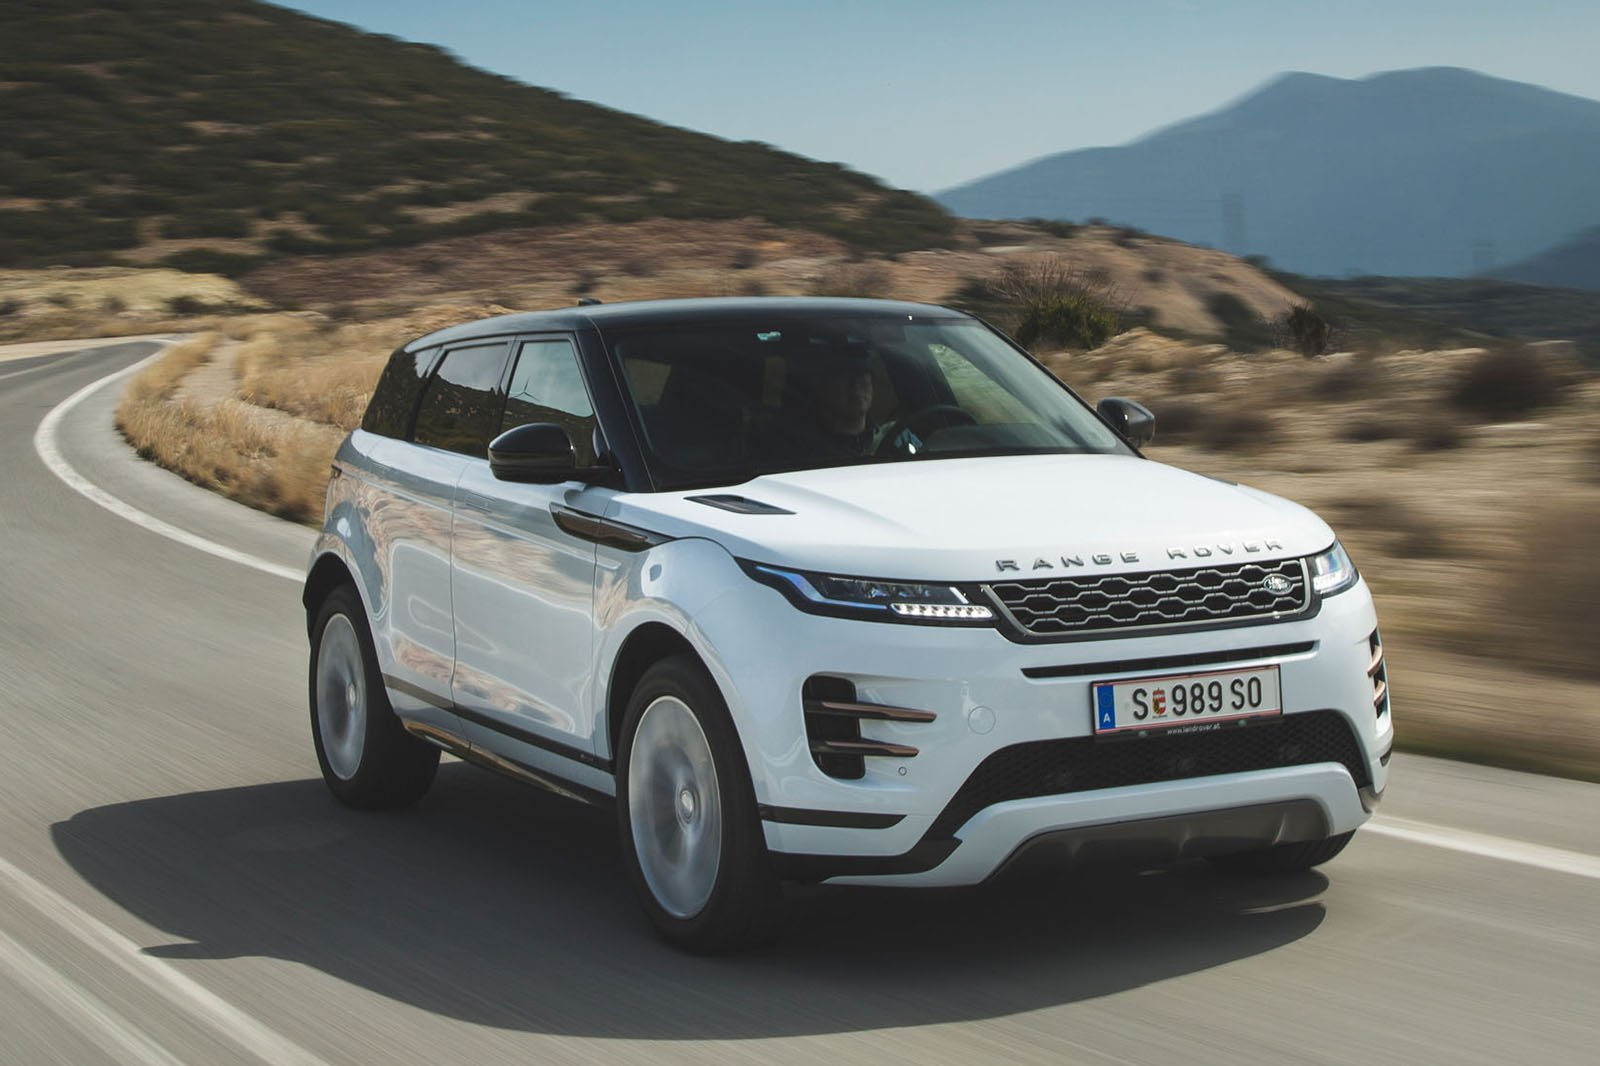 Range Rover Evoque 2019 front